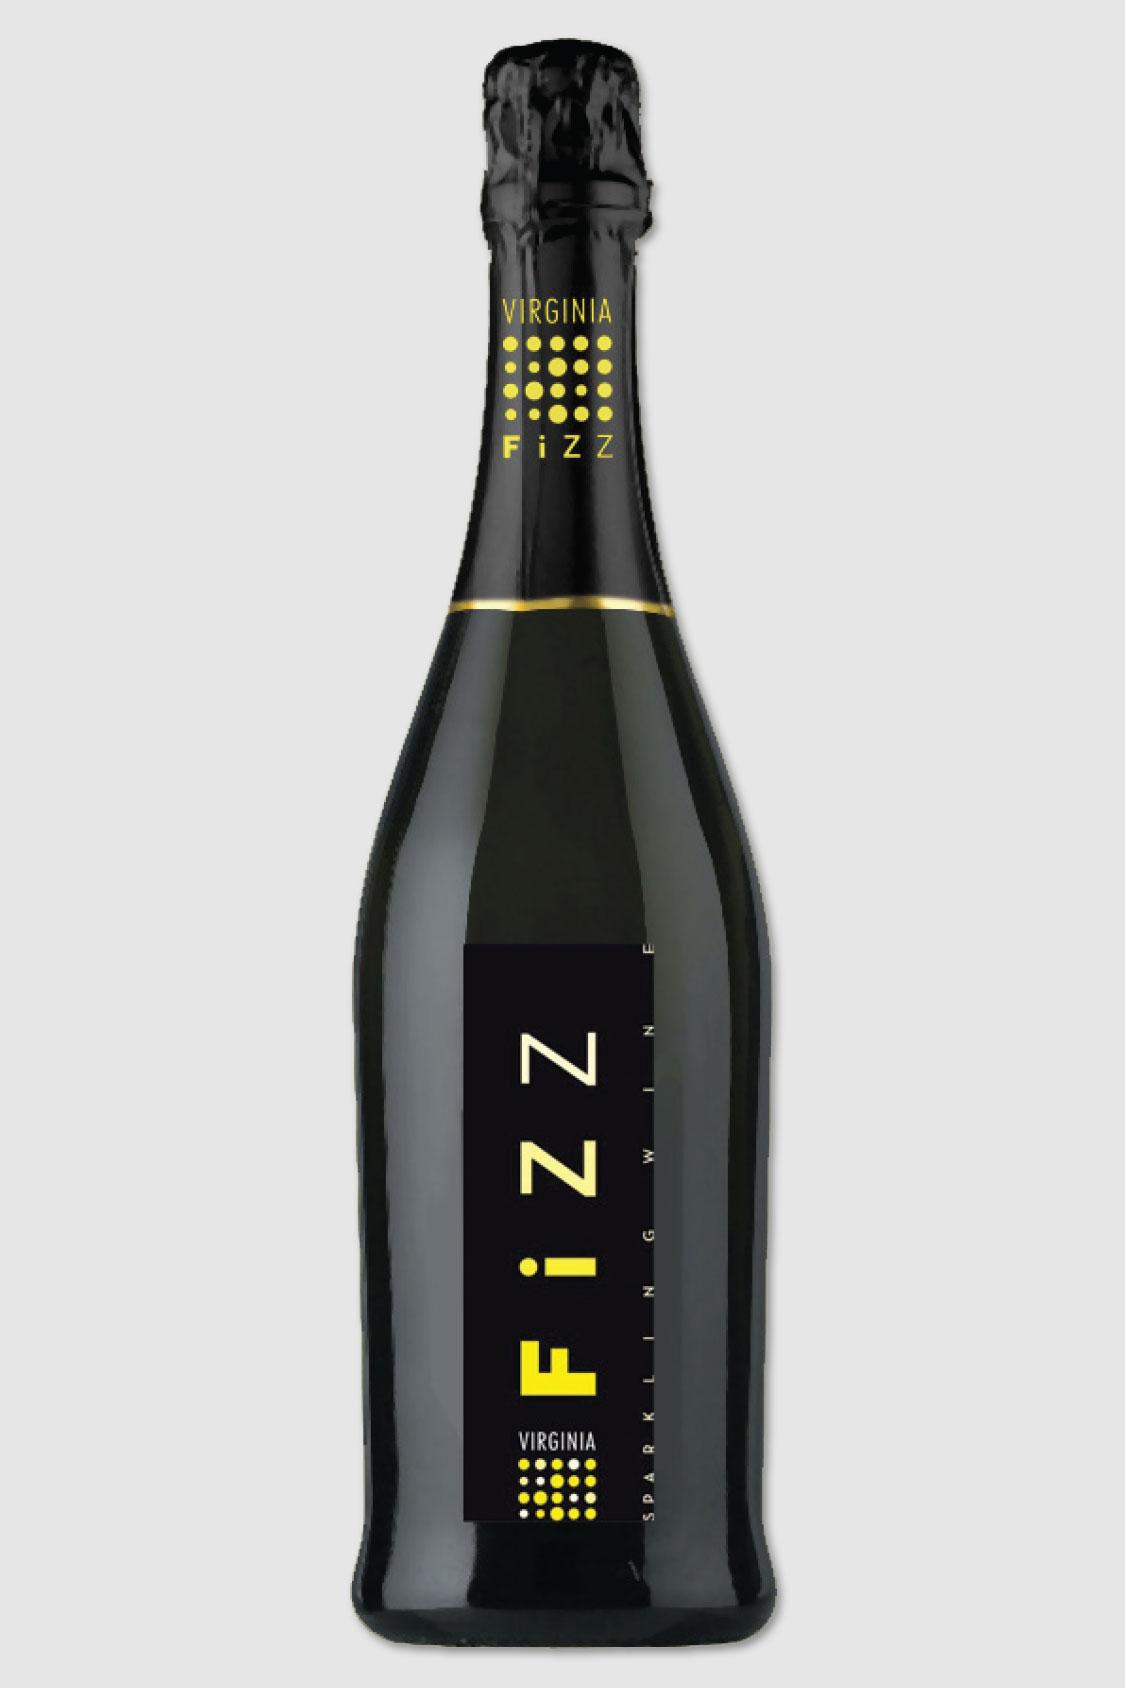 Thibaut-Janisson Winery - Virginia Fizz Sparkling Wine